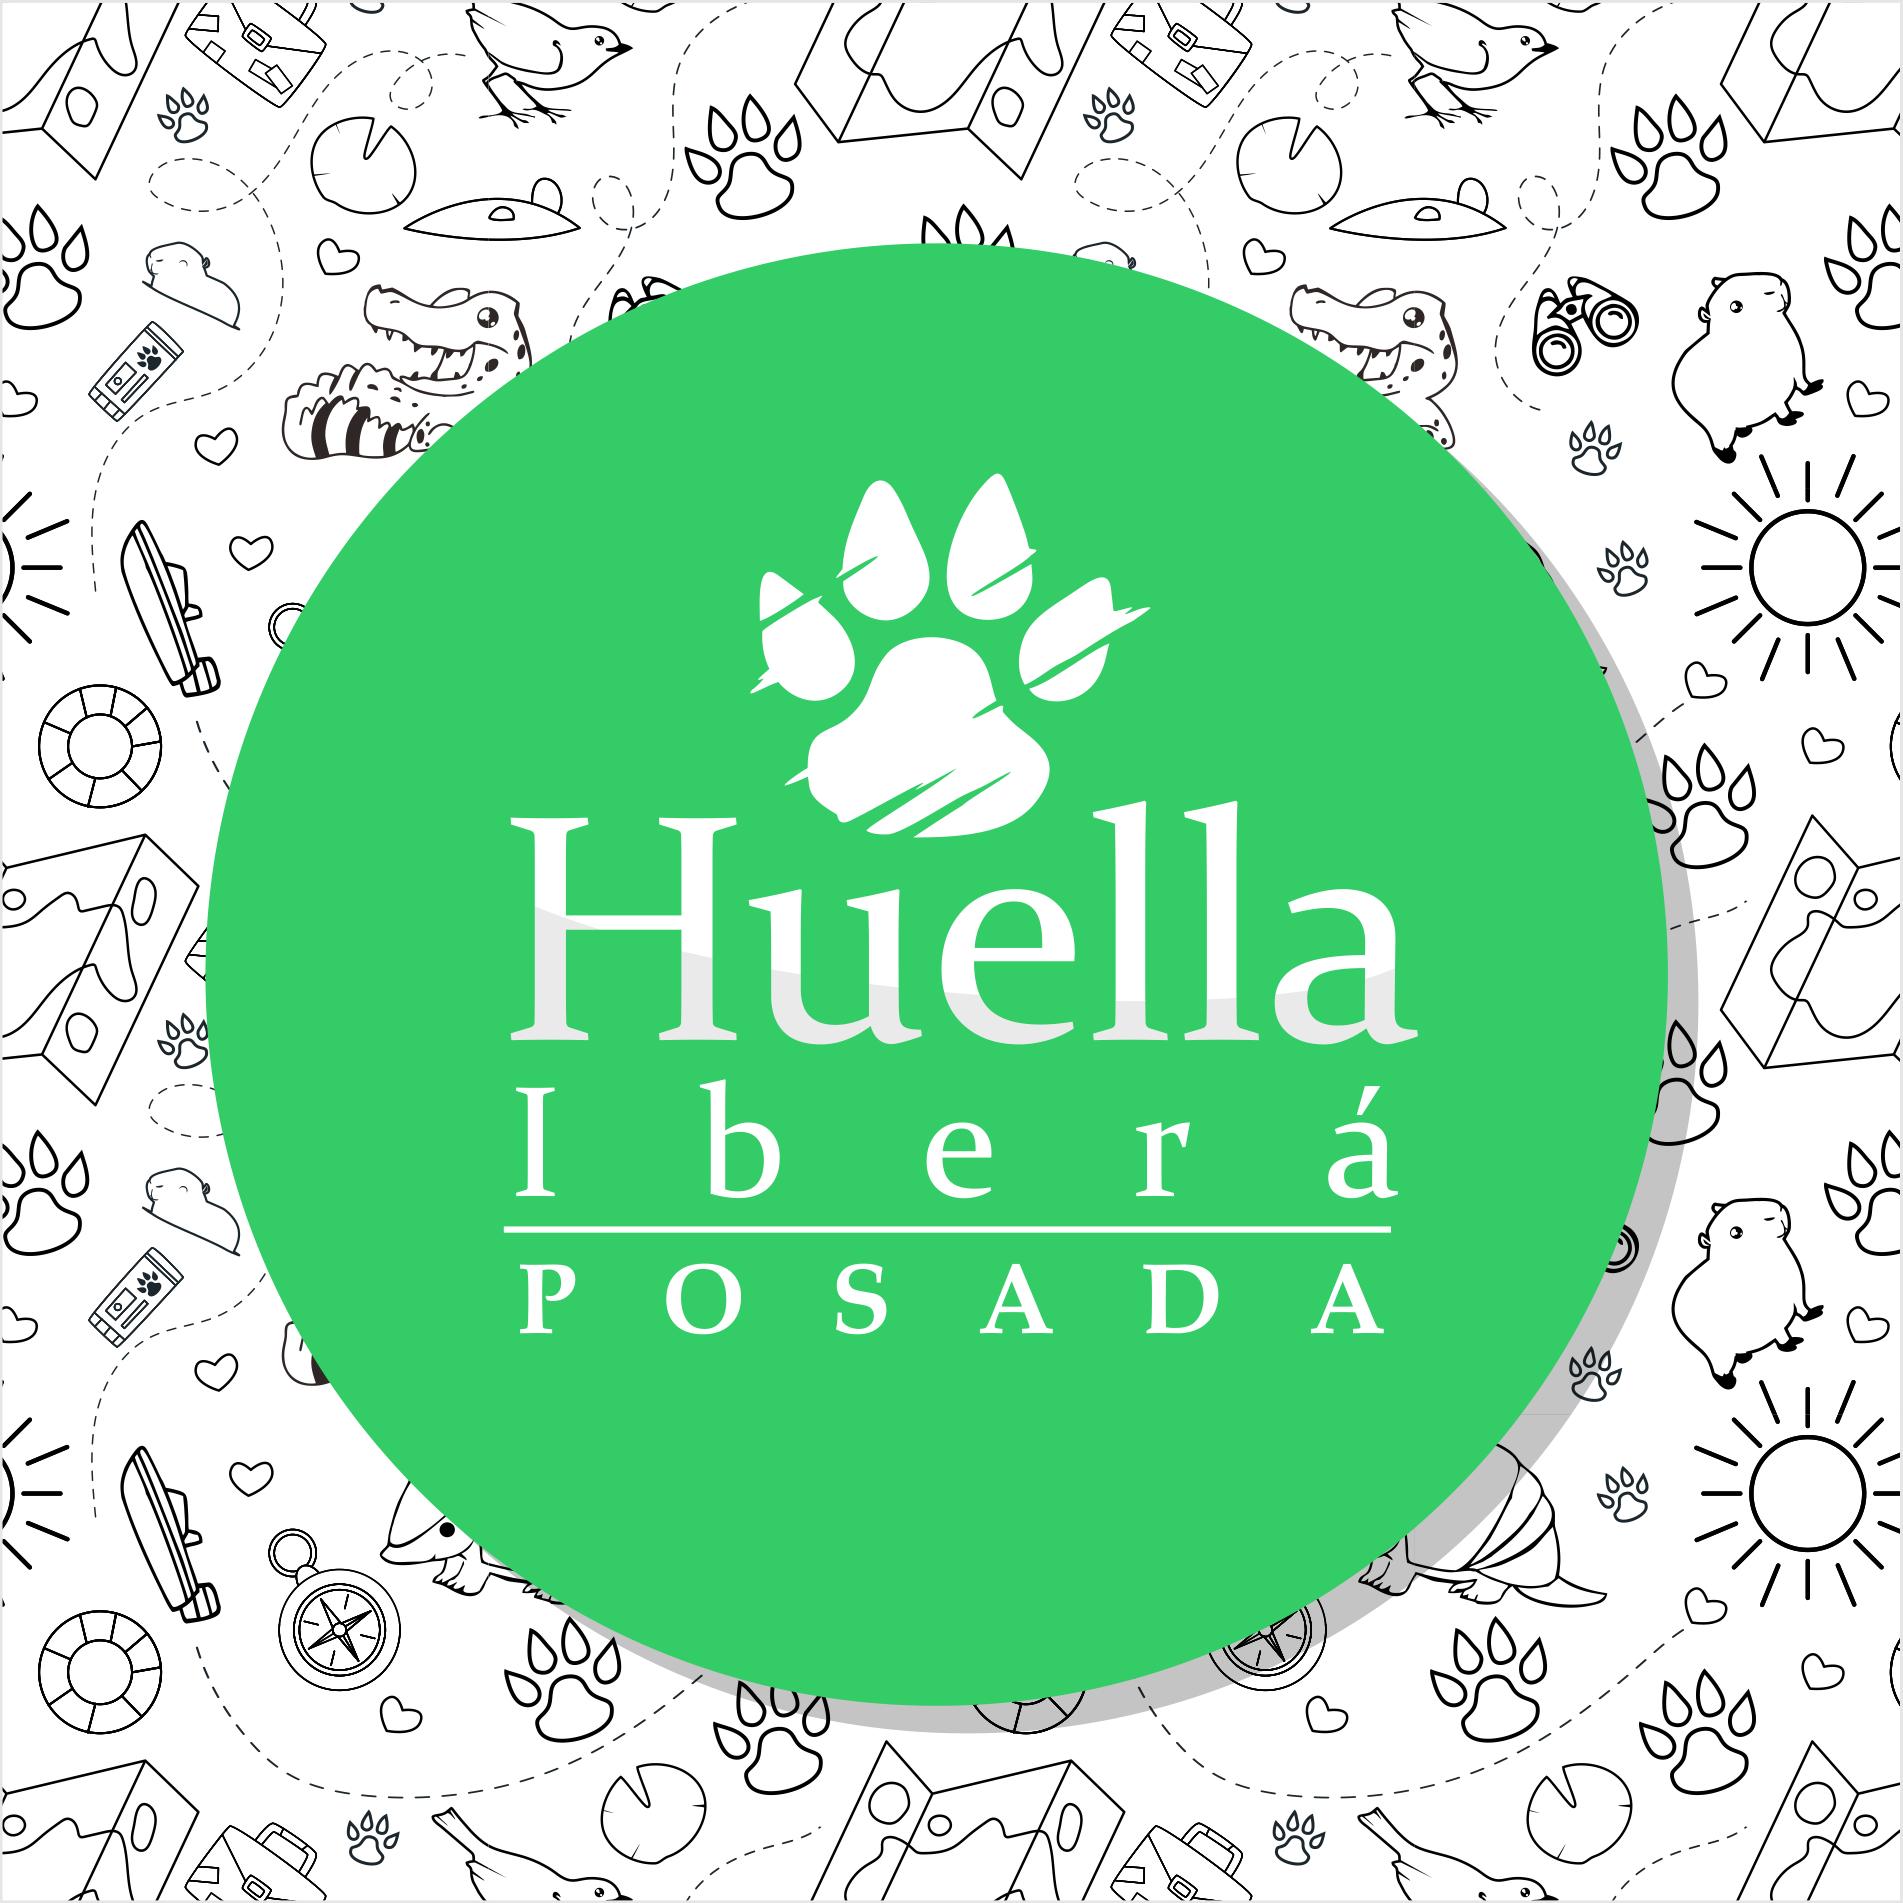 Huella Iberá